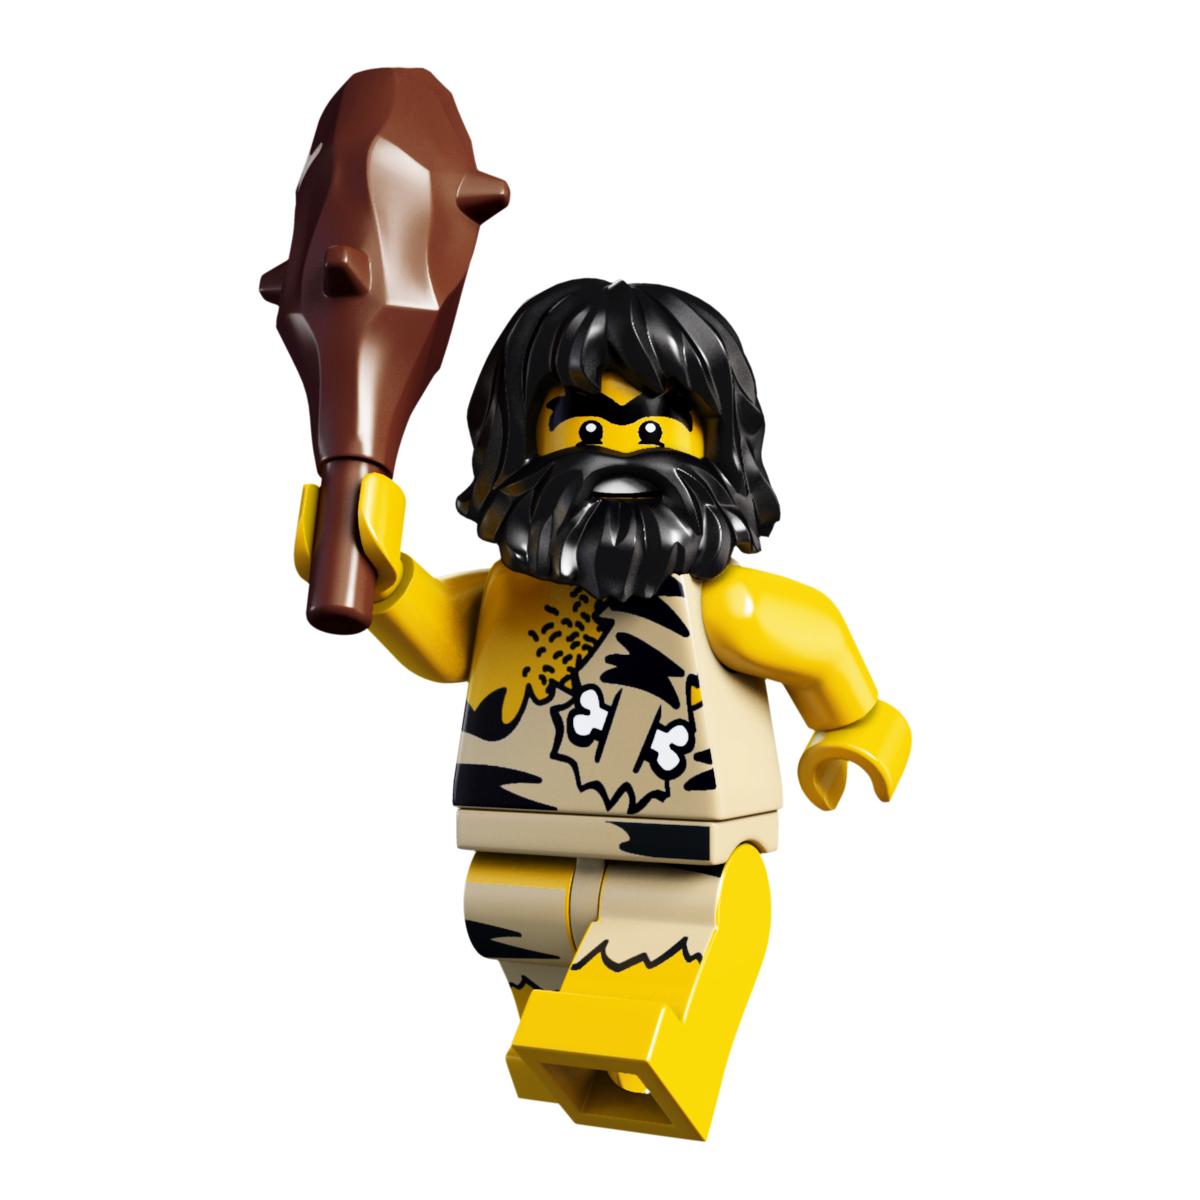 Caveman One Man Show : Caveman brickipedia fandom powered by wikia